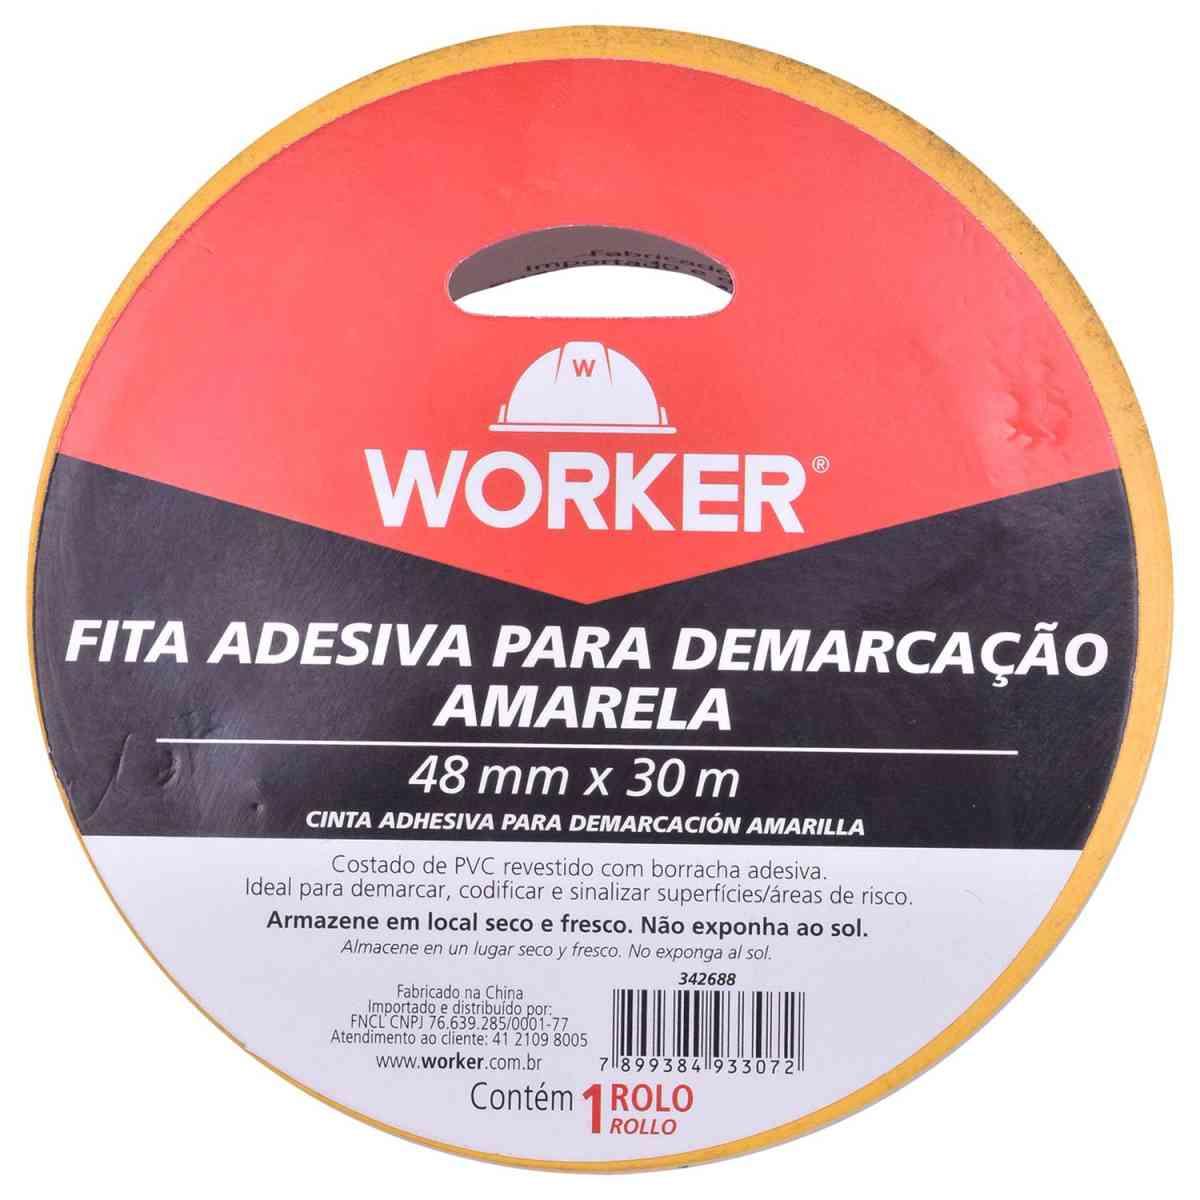 Fita Adesiva para Demarcação Amarela 48Mm X 30M Worker